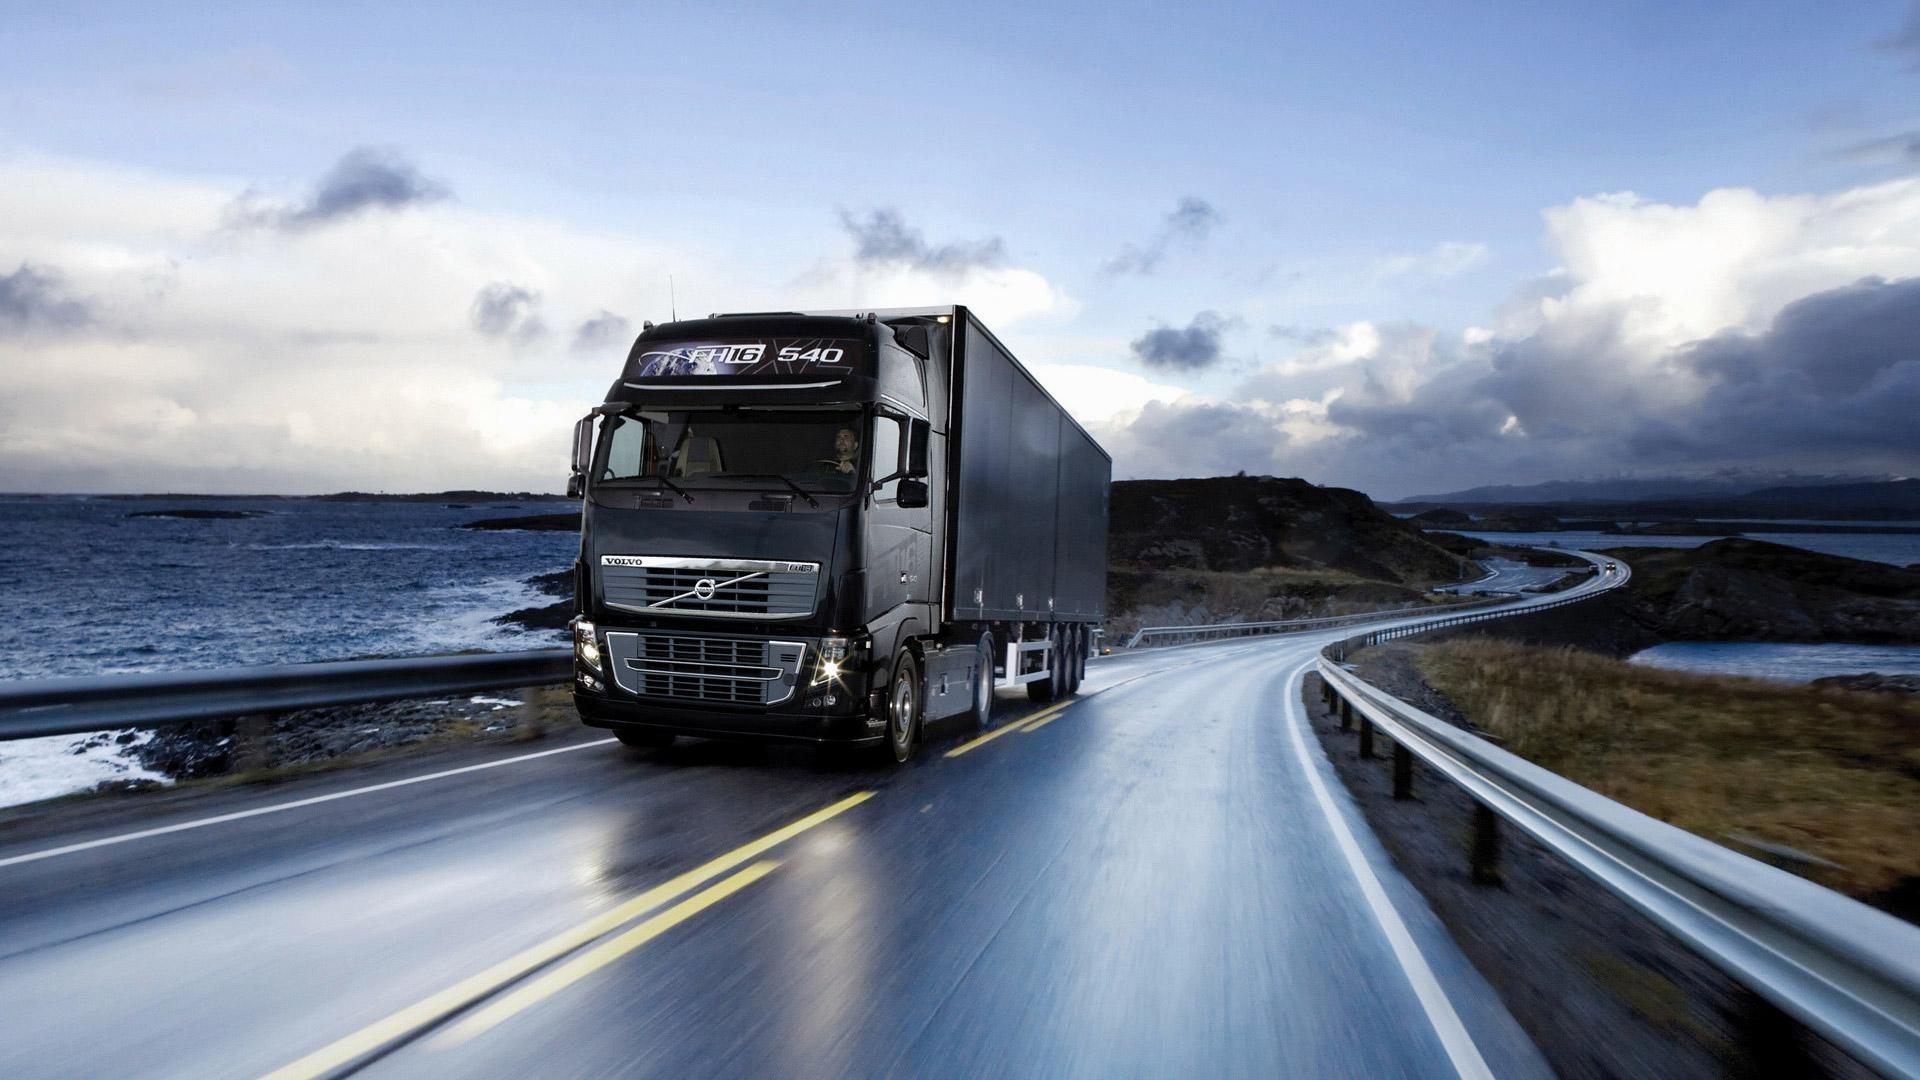 wallpaper.wiki-Semi-Truck-Photo-Download-Free-PIC-